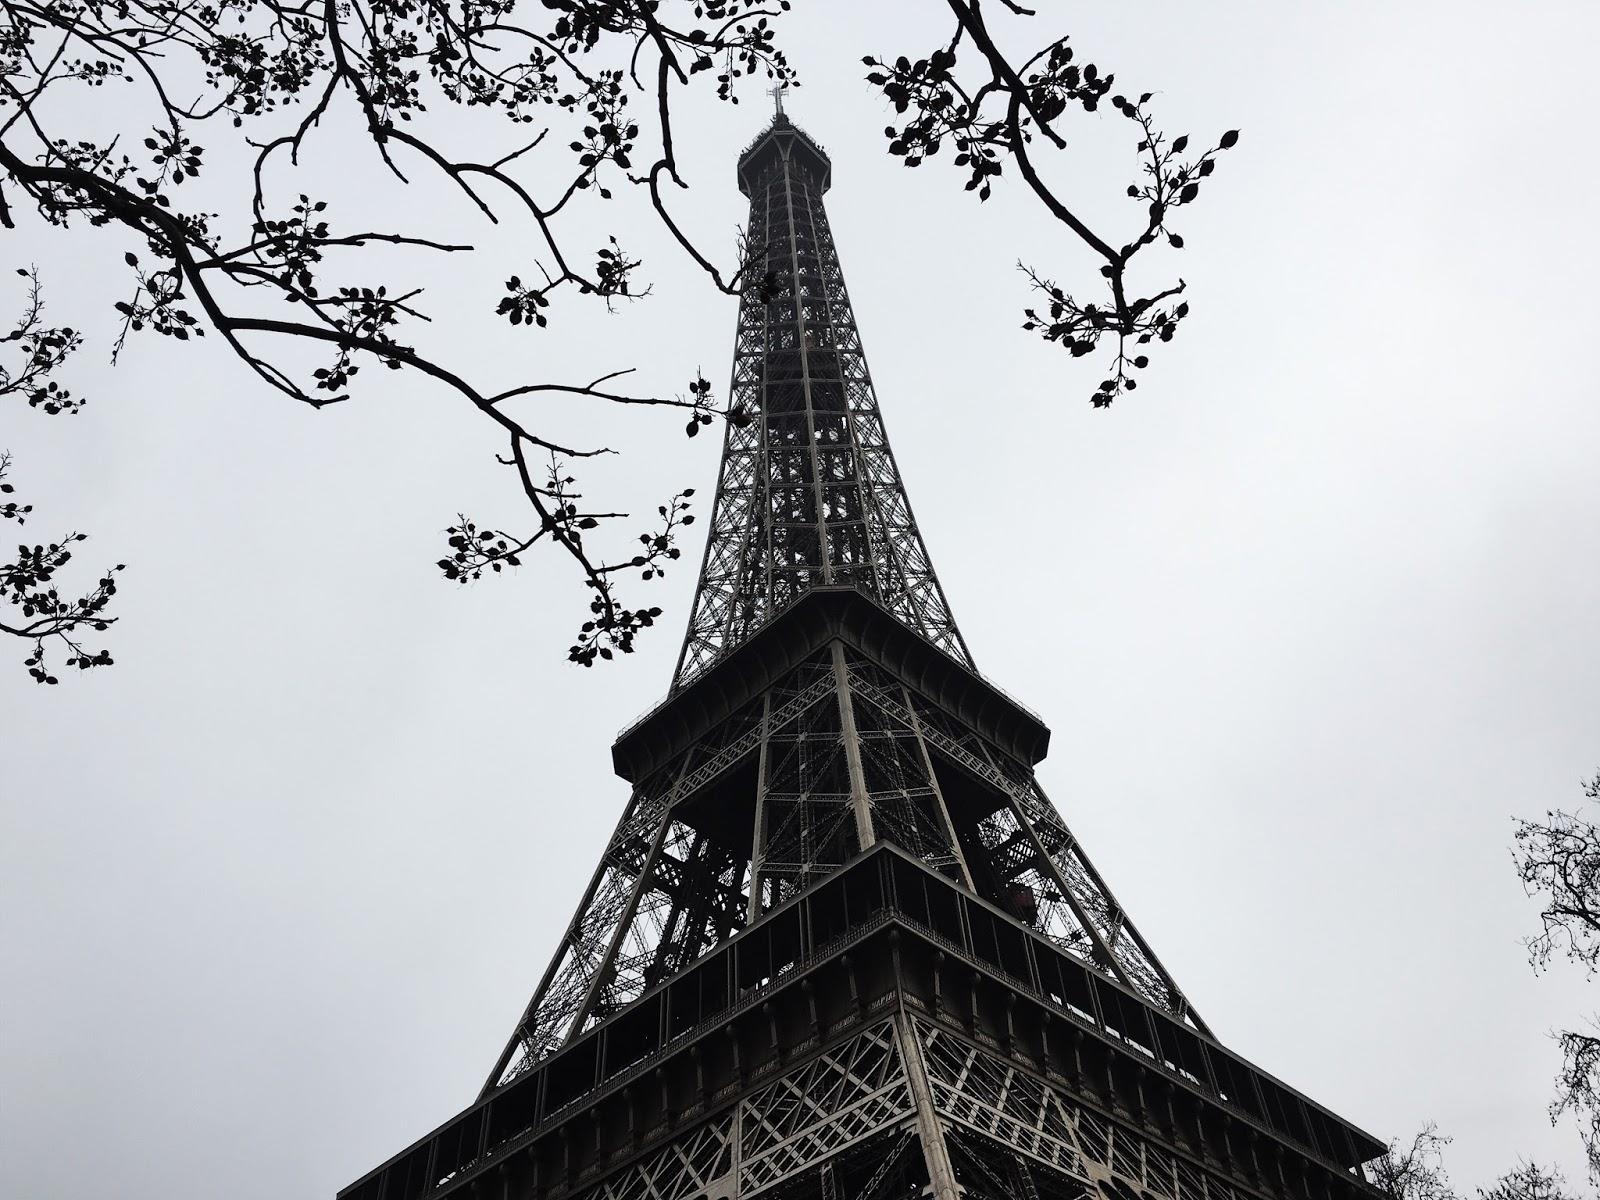 Eiffel Tower canvas messenger bag The Eiffel Tower in Paris Historic Famous Landmark Wintertime Picture Print canvas beach bag Black White 12x15-10